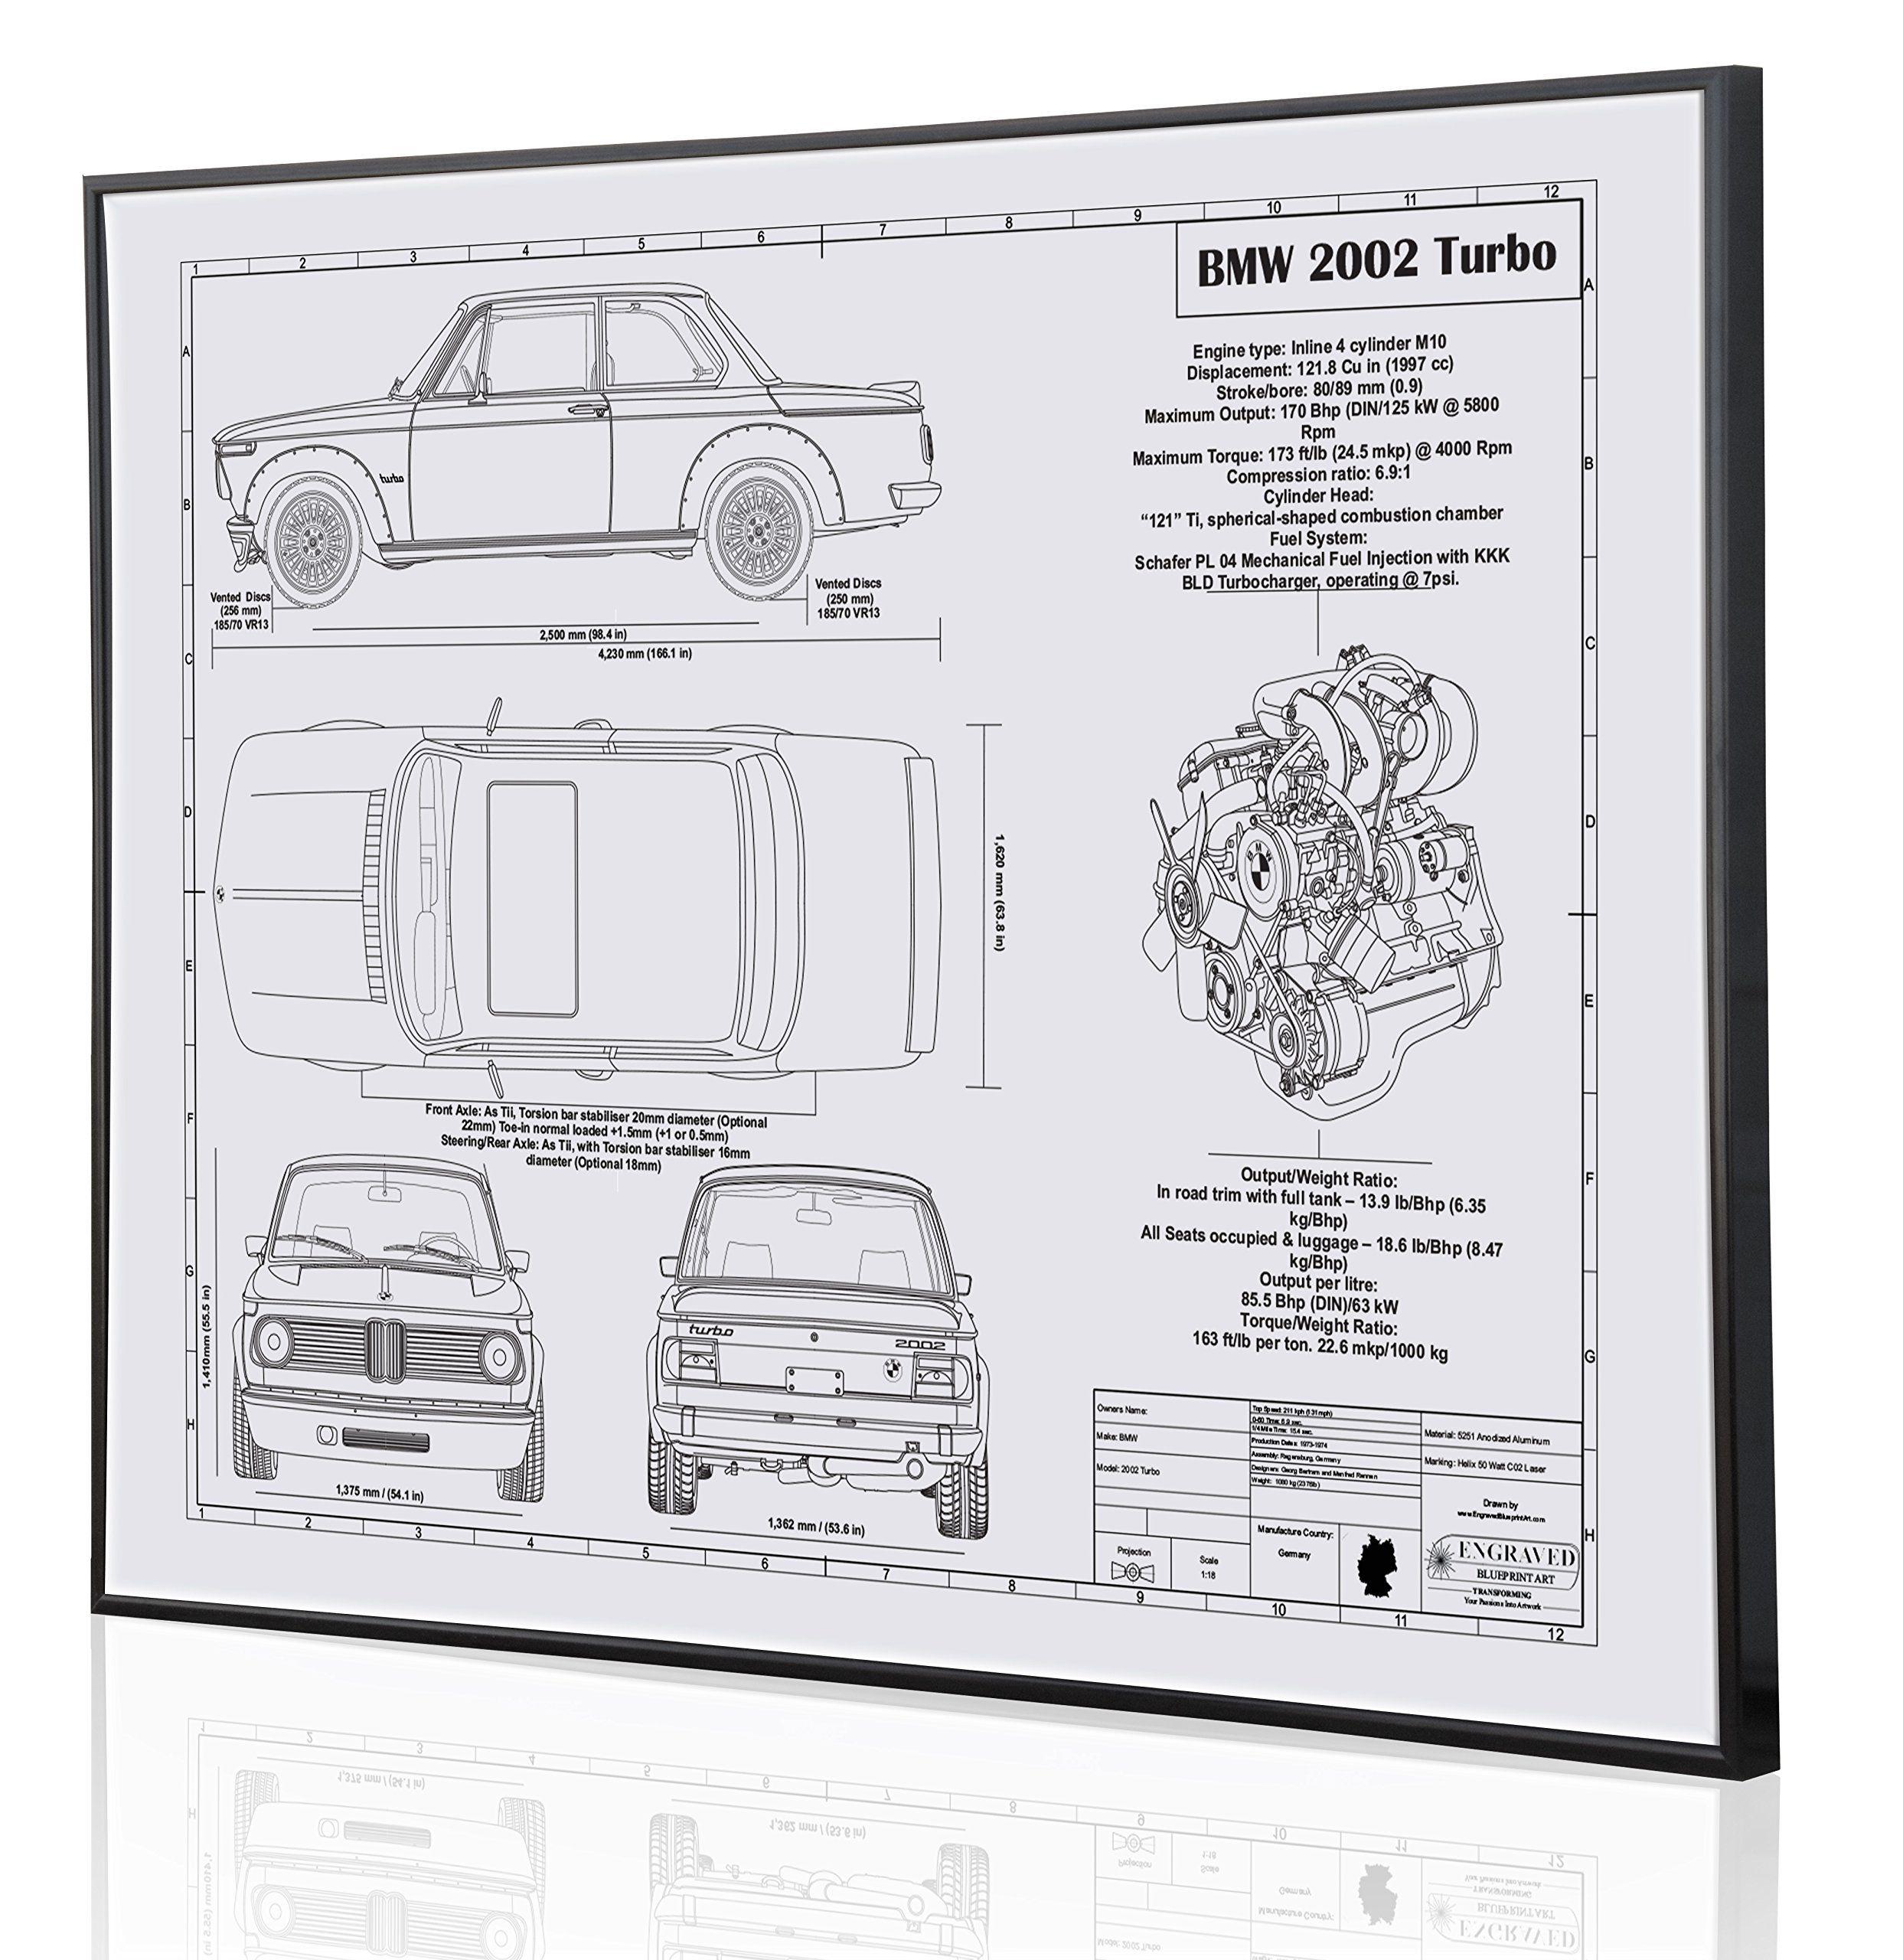 hight resolution of bmw 2002 blueprint artwork laser marked